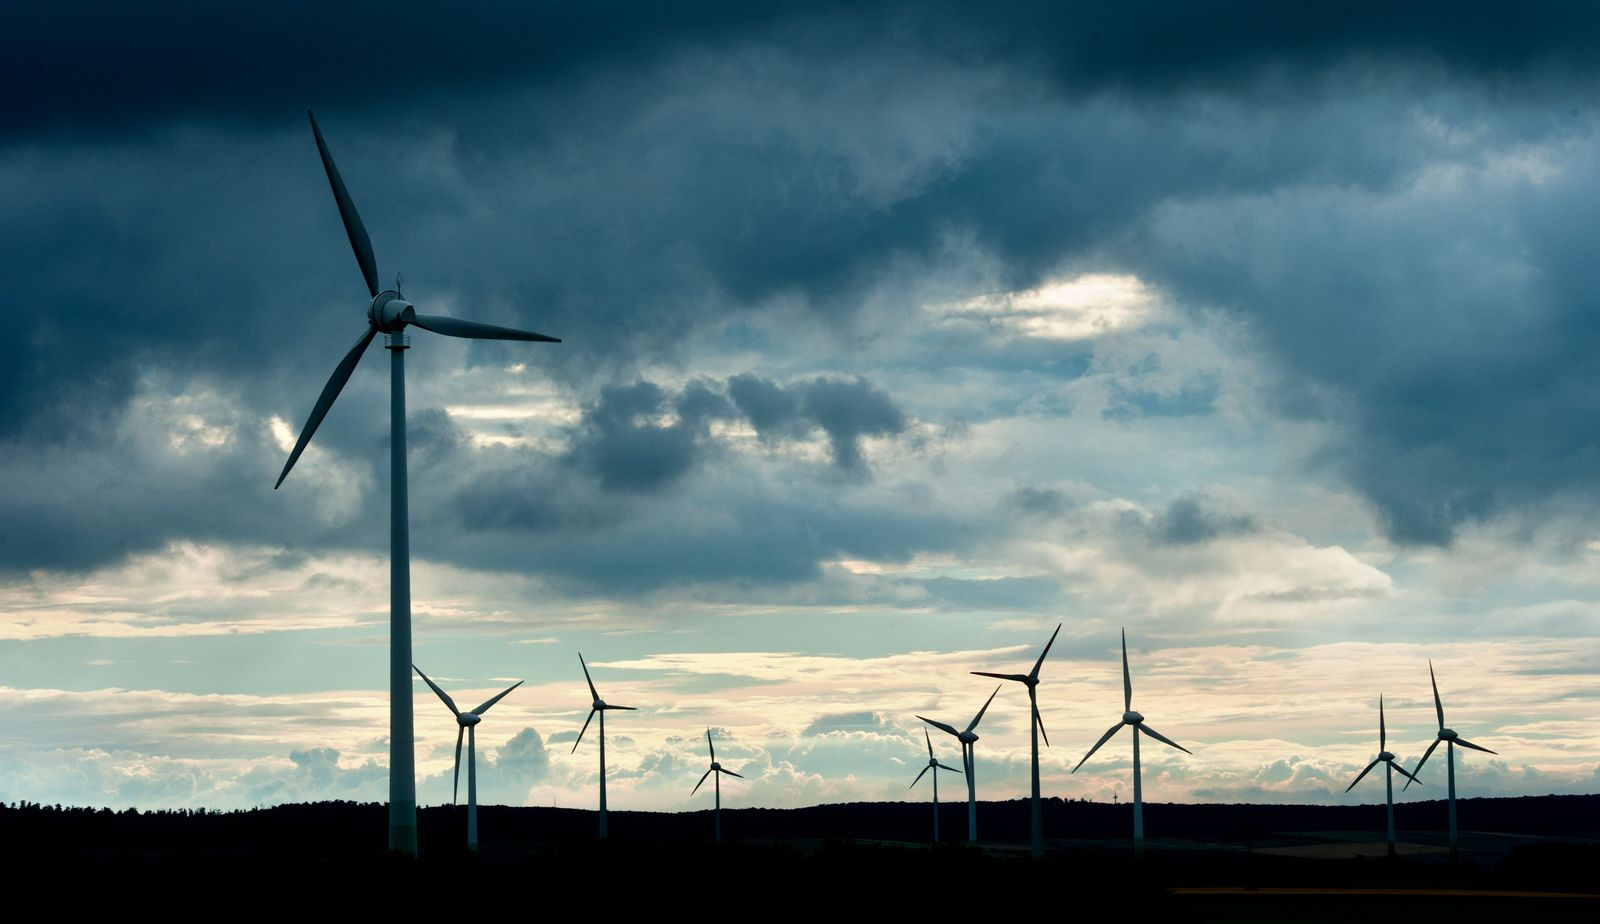 Windräder / Windenergie / Energie / Erneuerbare Energien